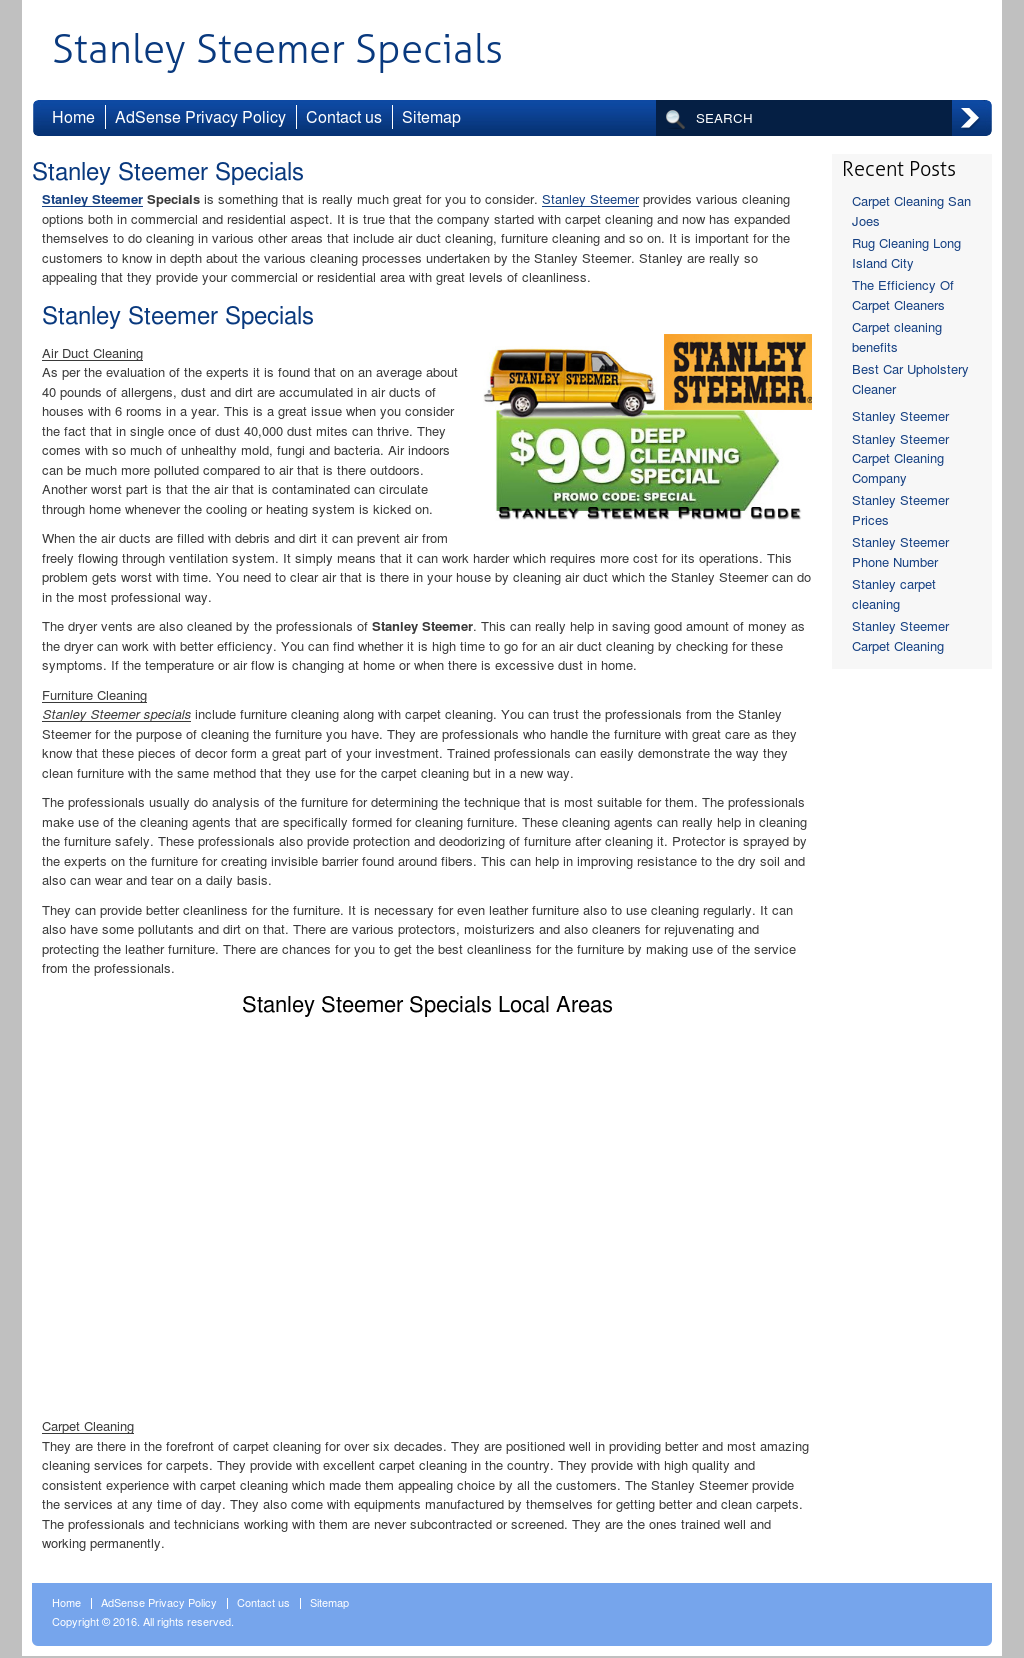 Stanley Steemer Competitors, Revenue